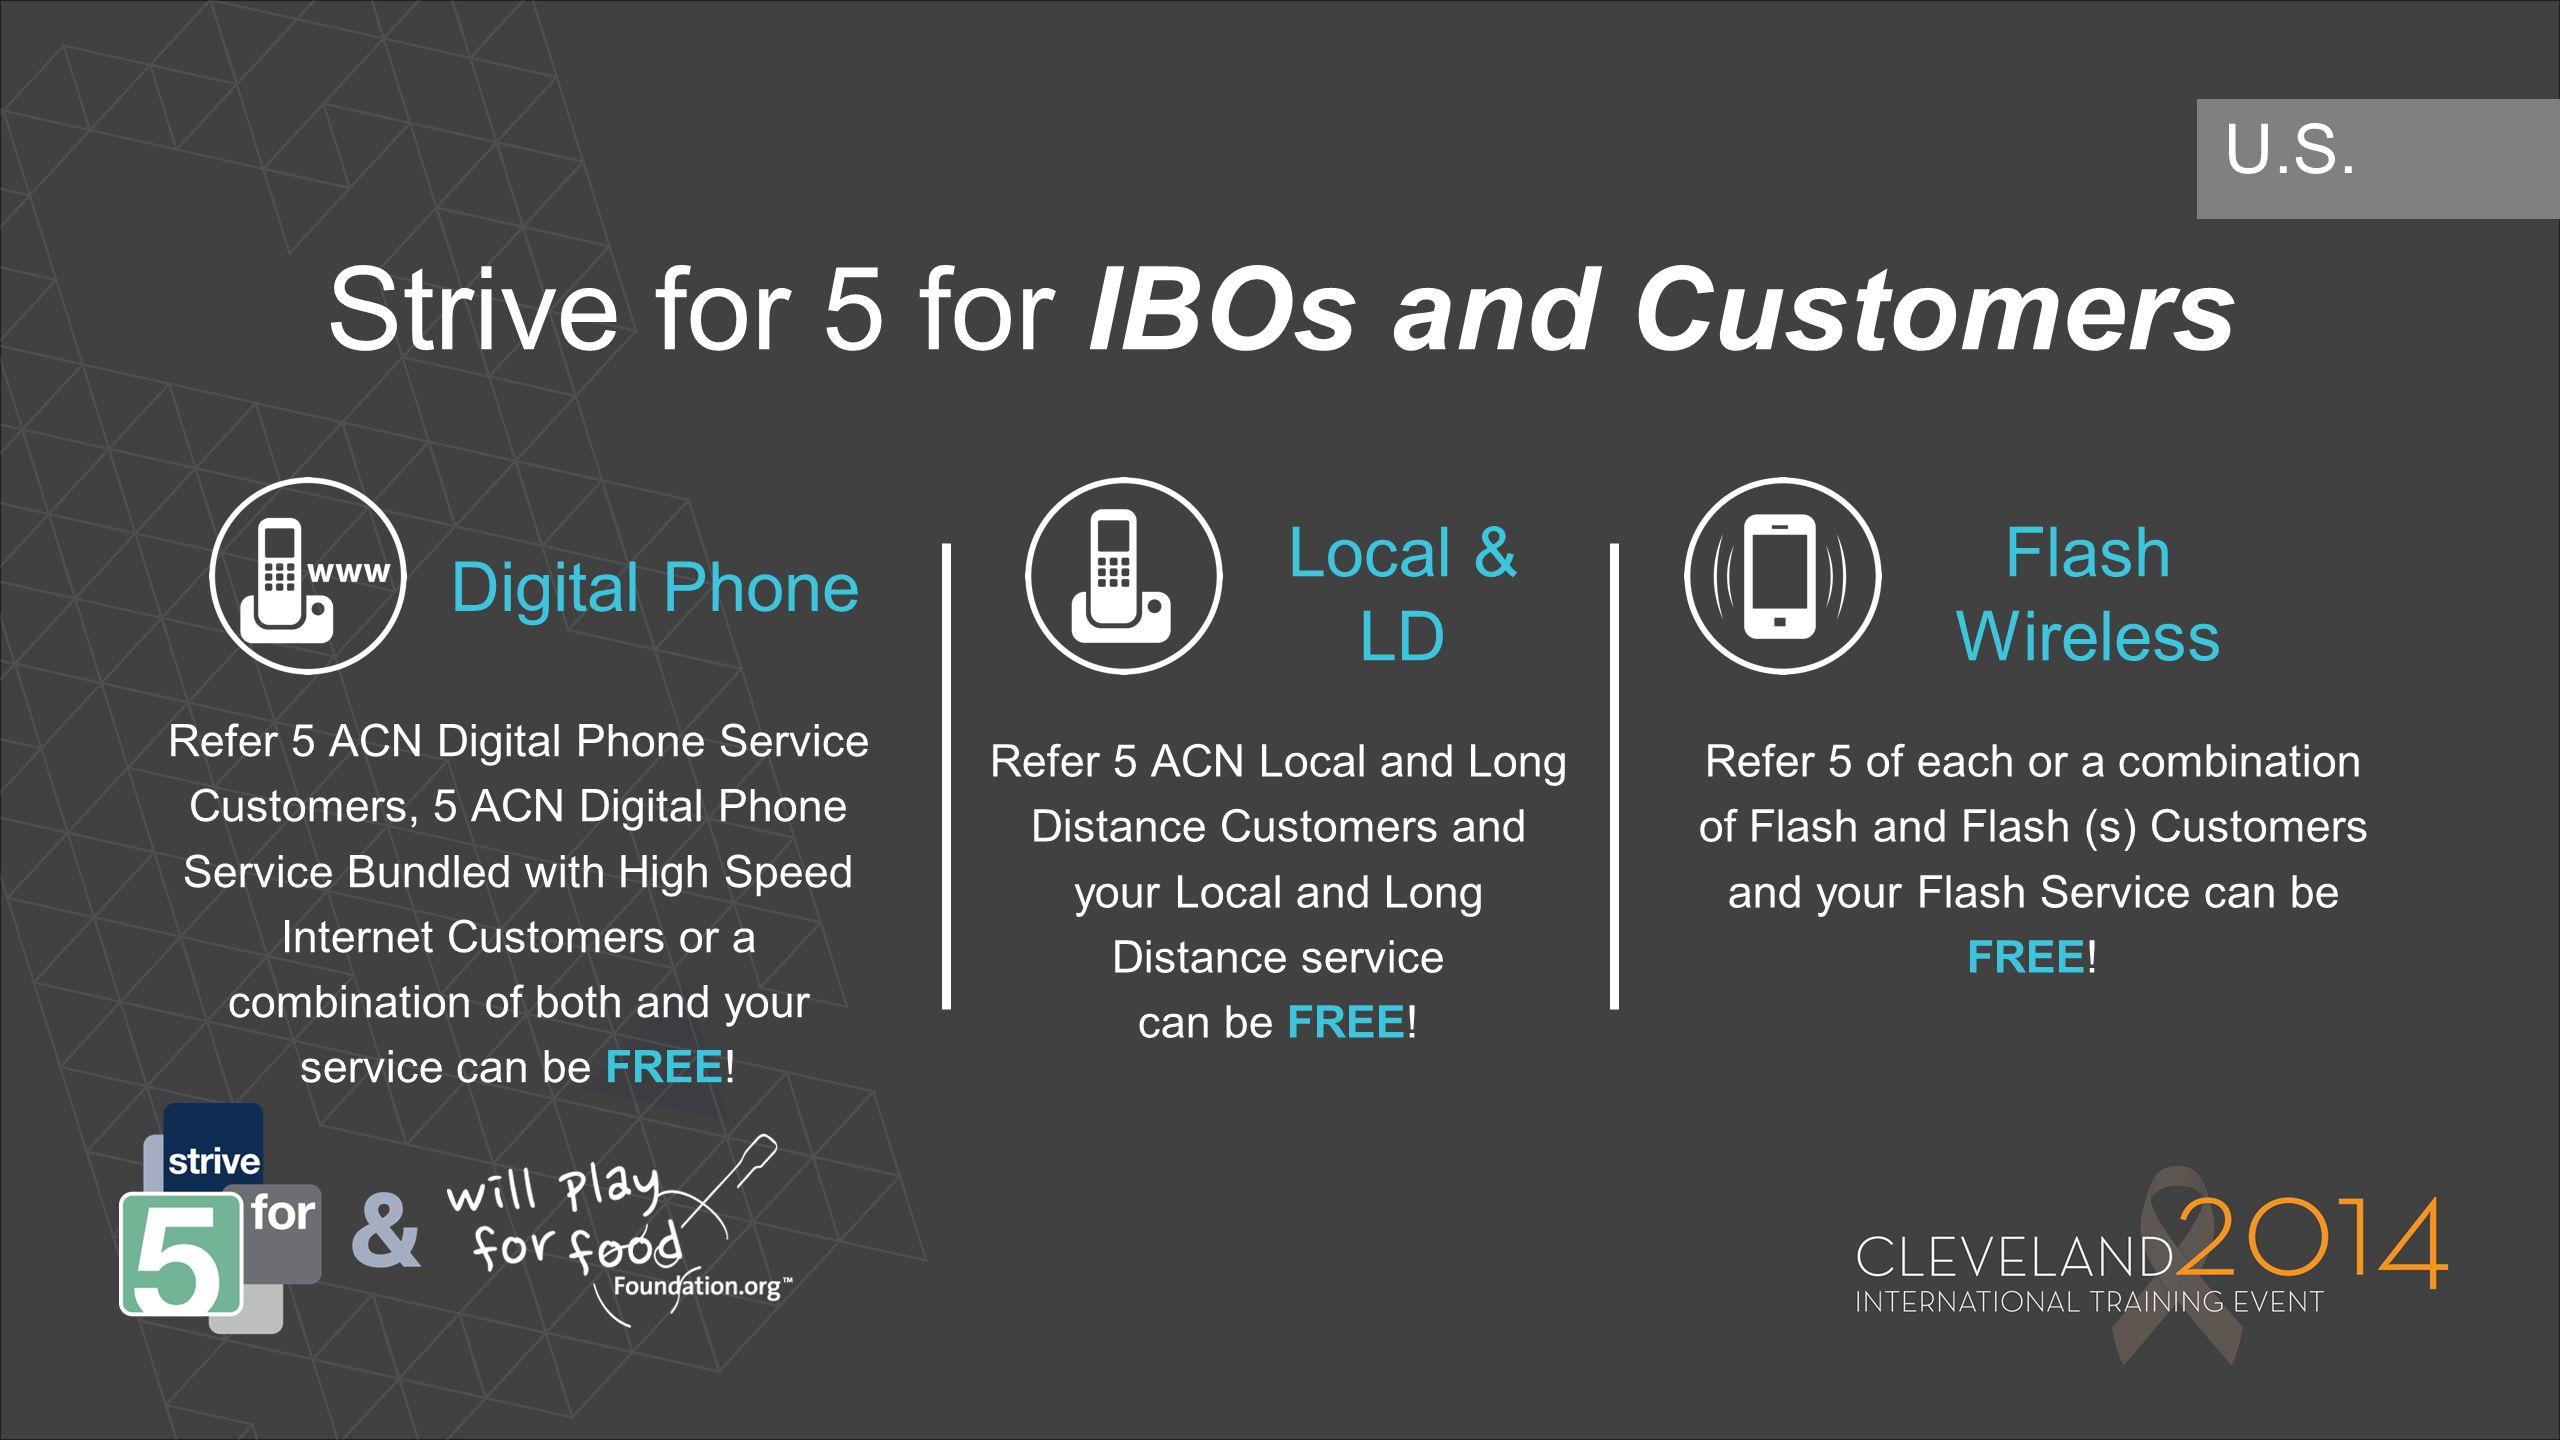 Digital Phone Local & LD Flash Wireless Refer 5 ACN Digital Phone Service Customers, 5 ACN Digital Phone Service Bundled with High Speed Internet Cust